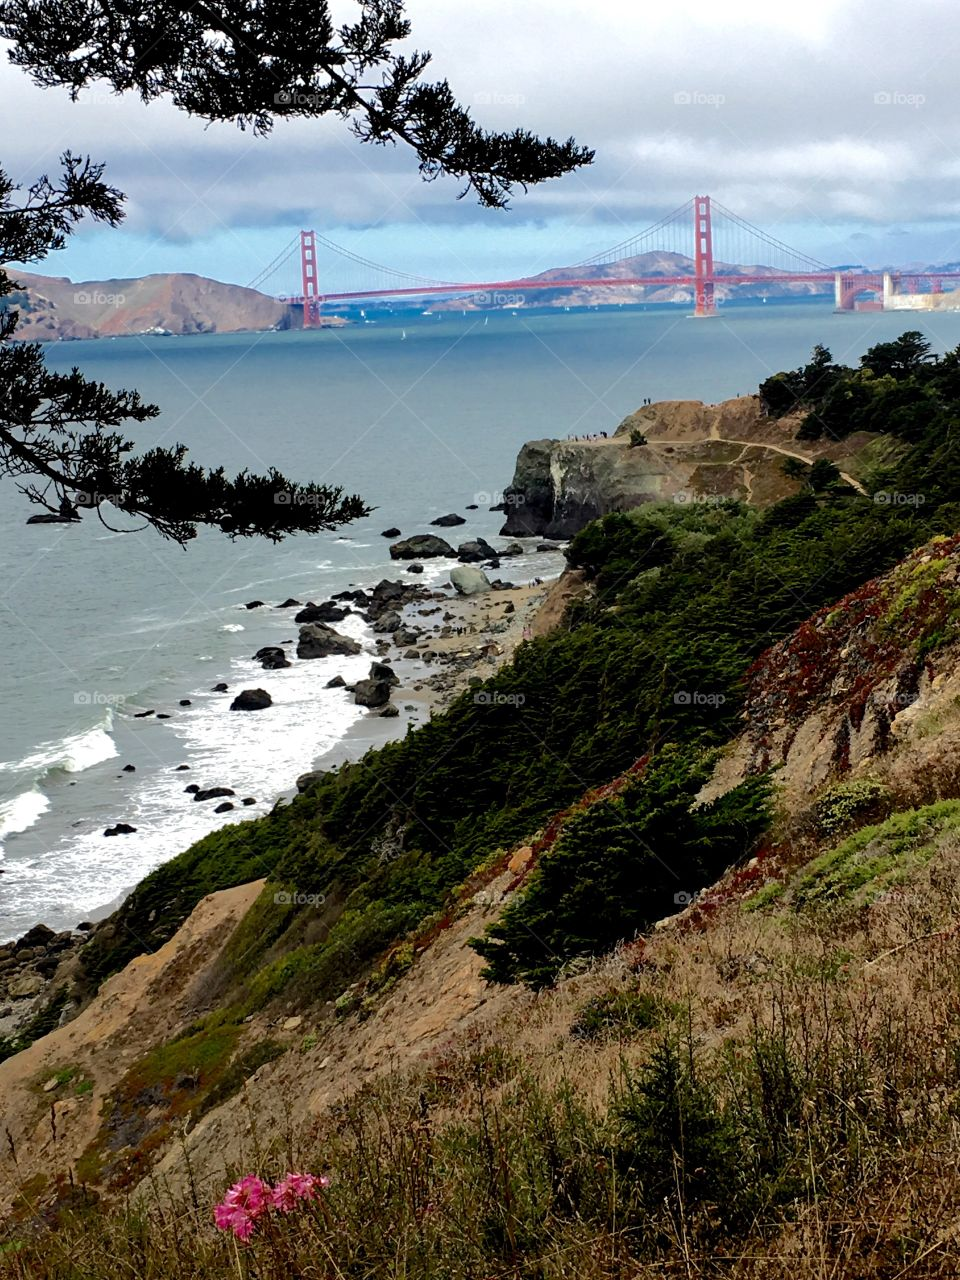 View of Golden Gate Bridge, San Francisco